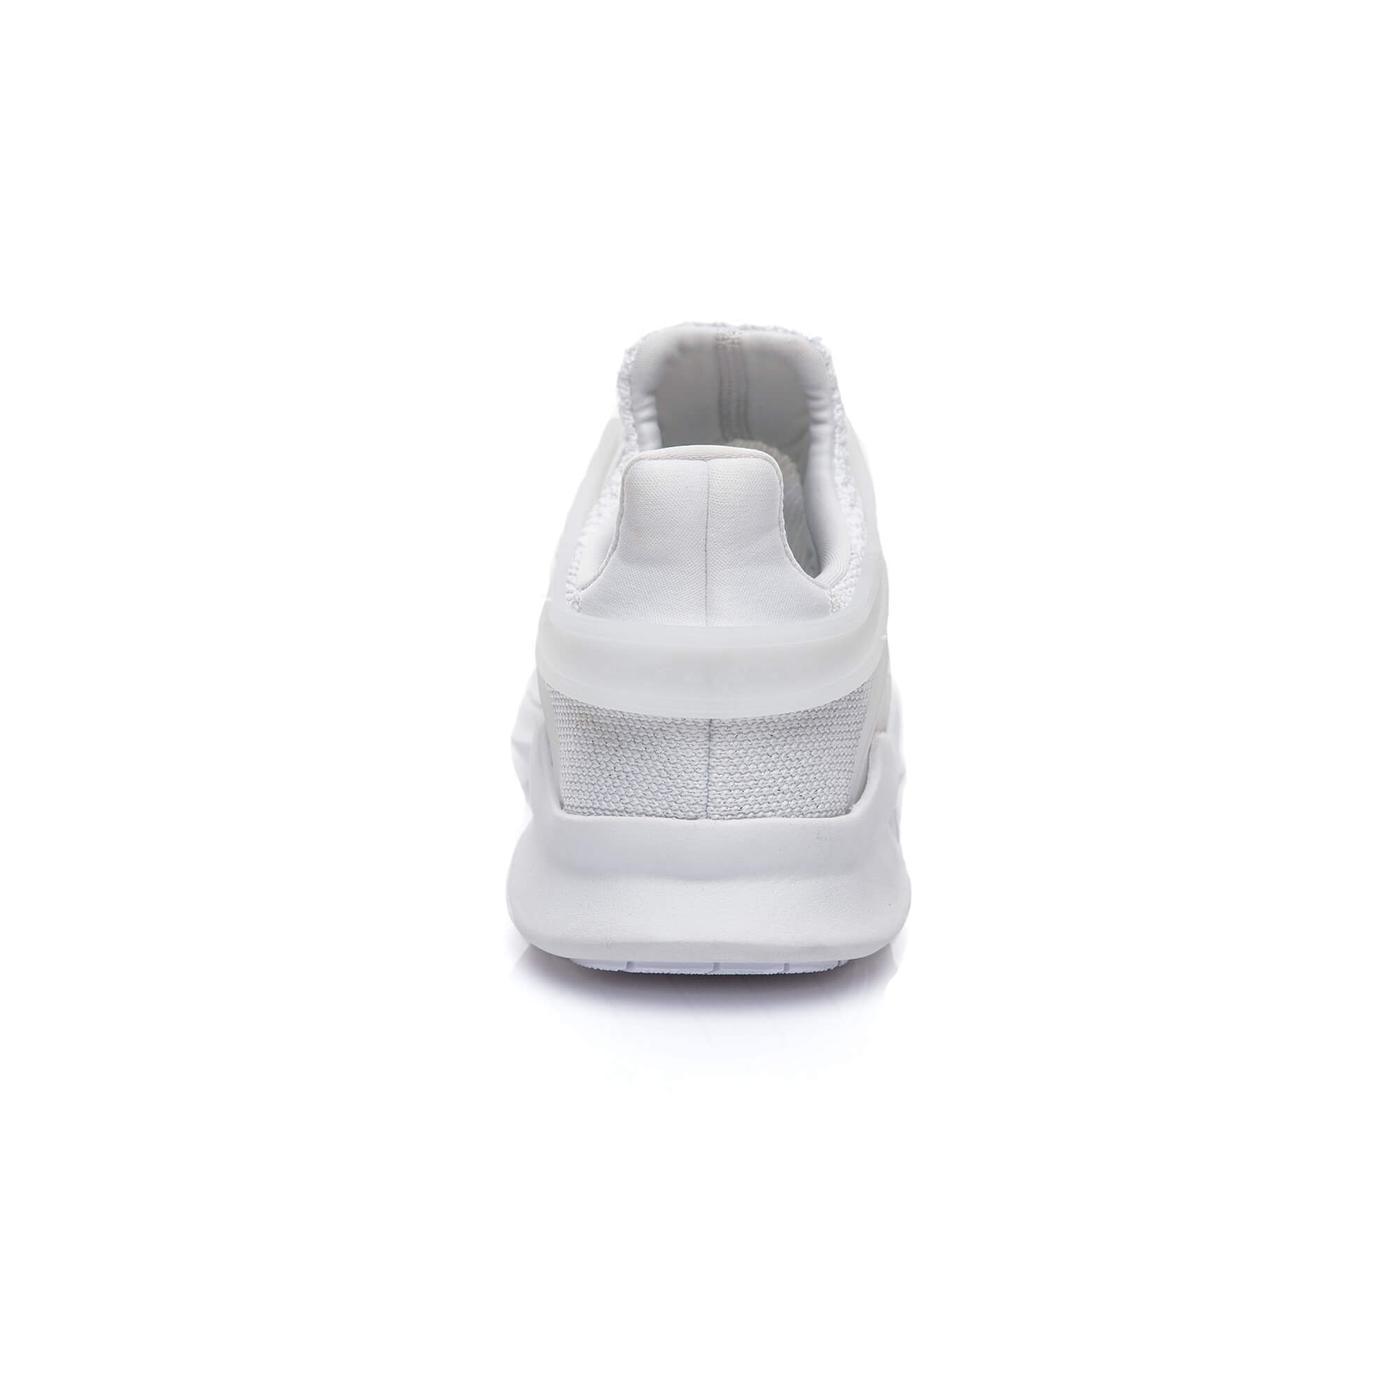 adidas Eqt Support Adv Kadın Beyaz Spor Ayakkabı